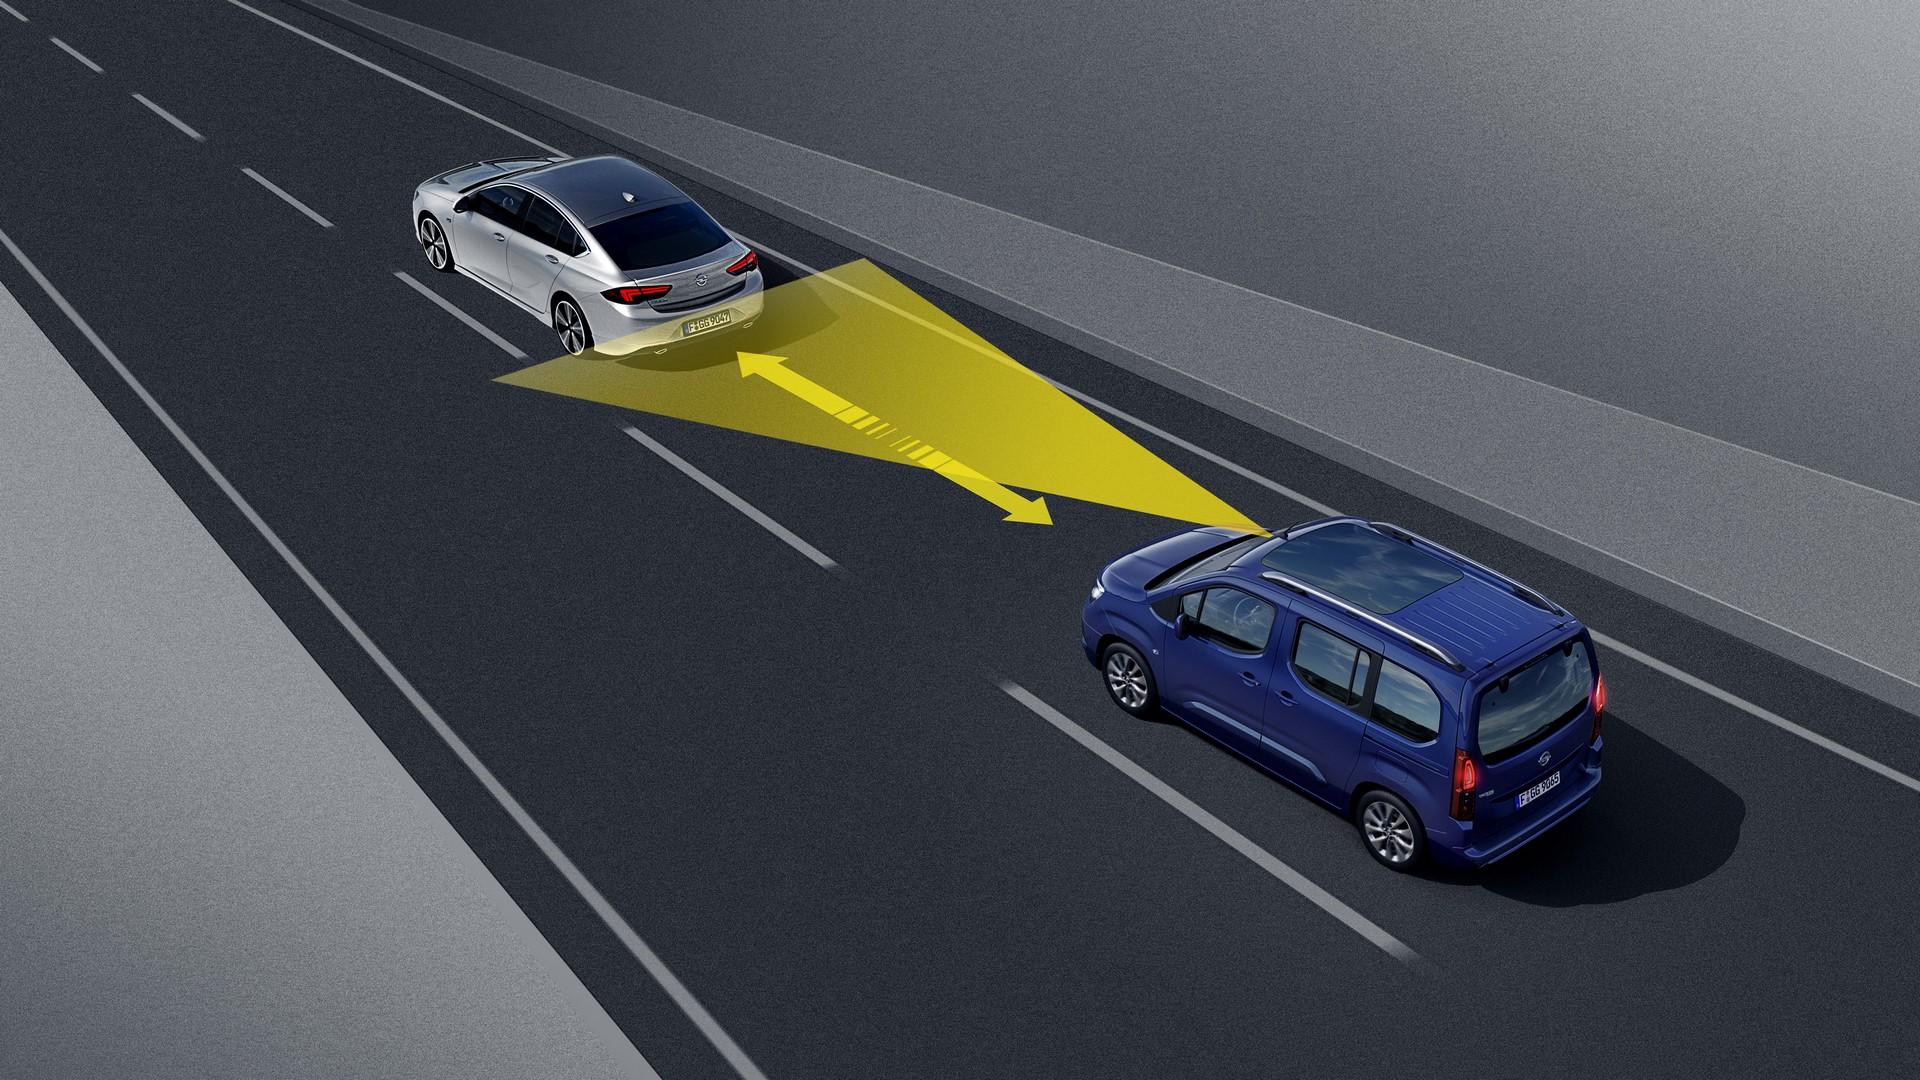 Opel Combo Life, Automatic Cruise Control